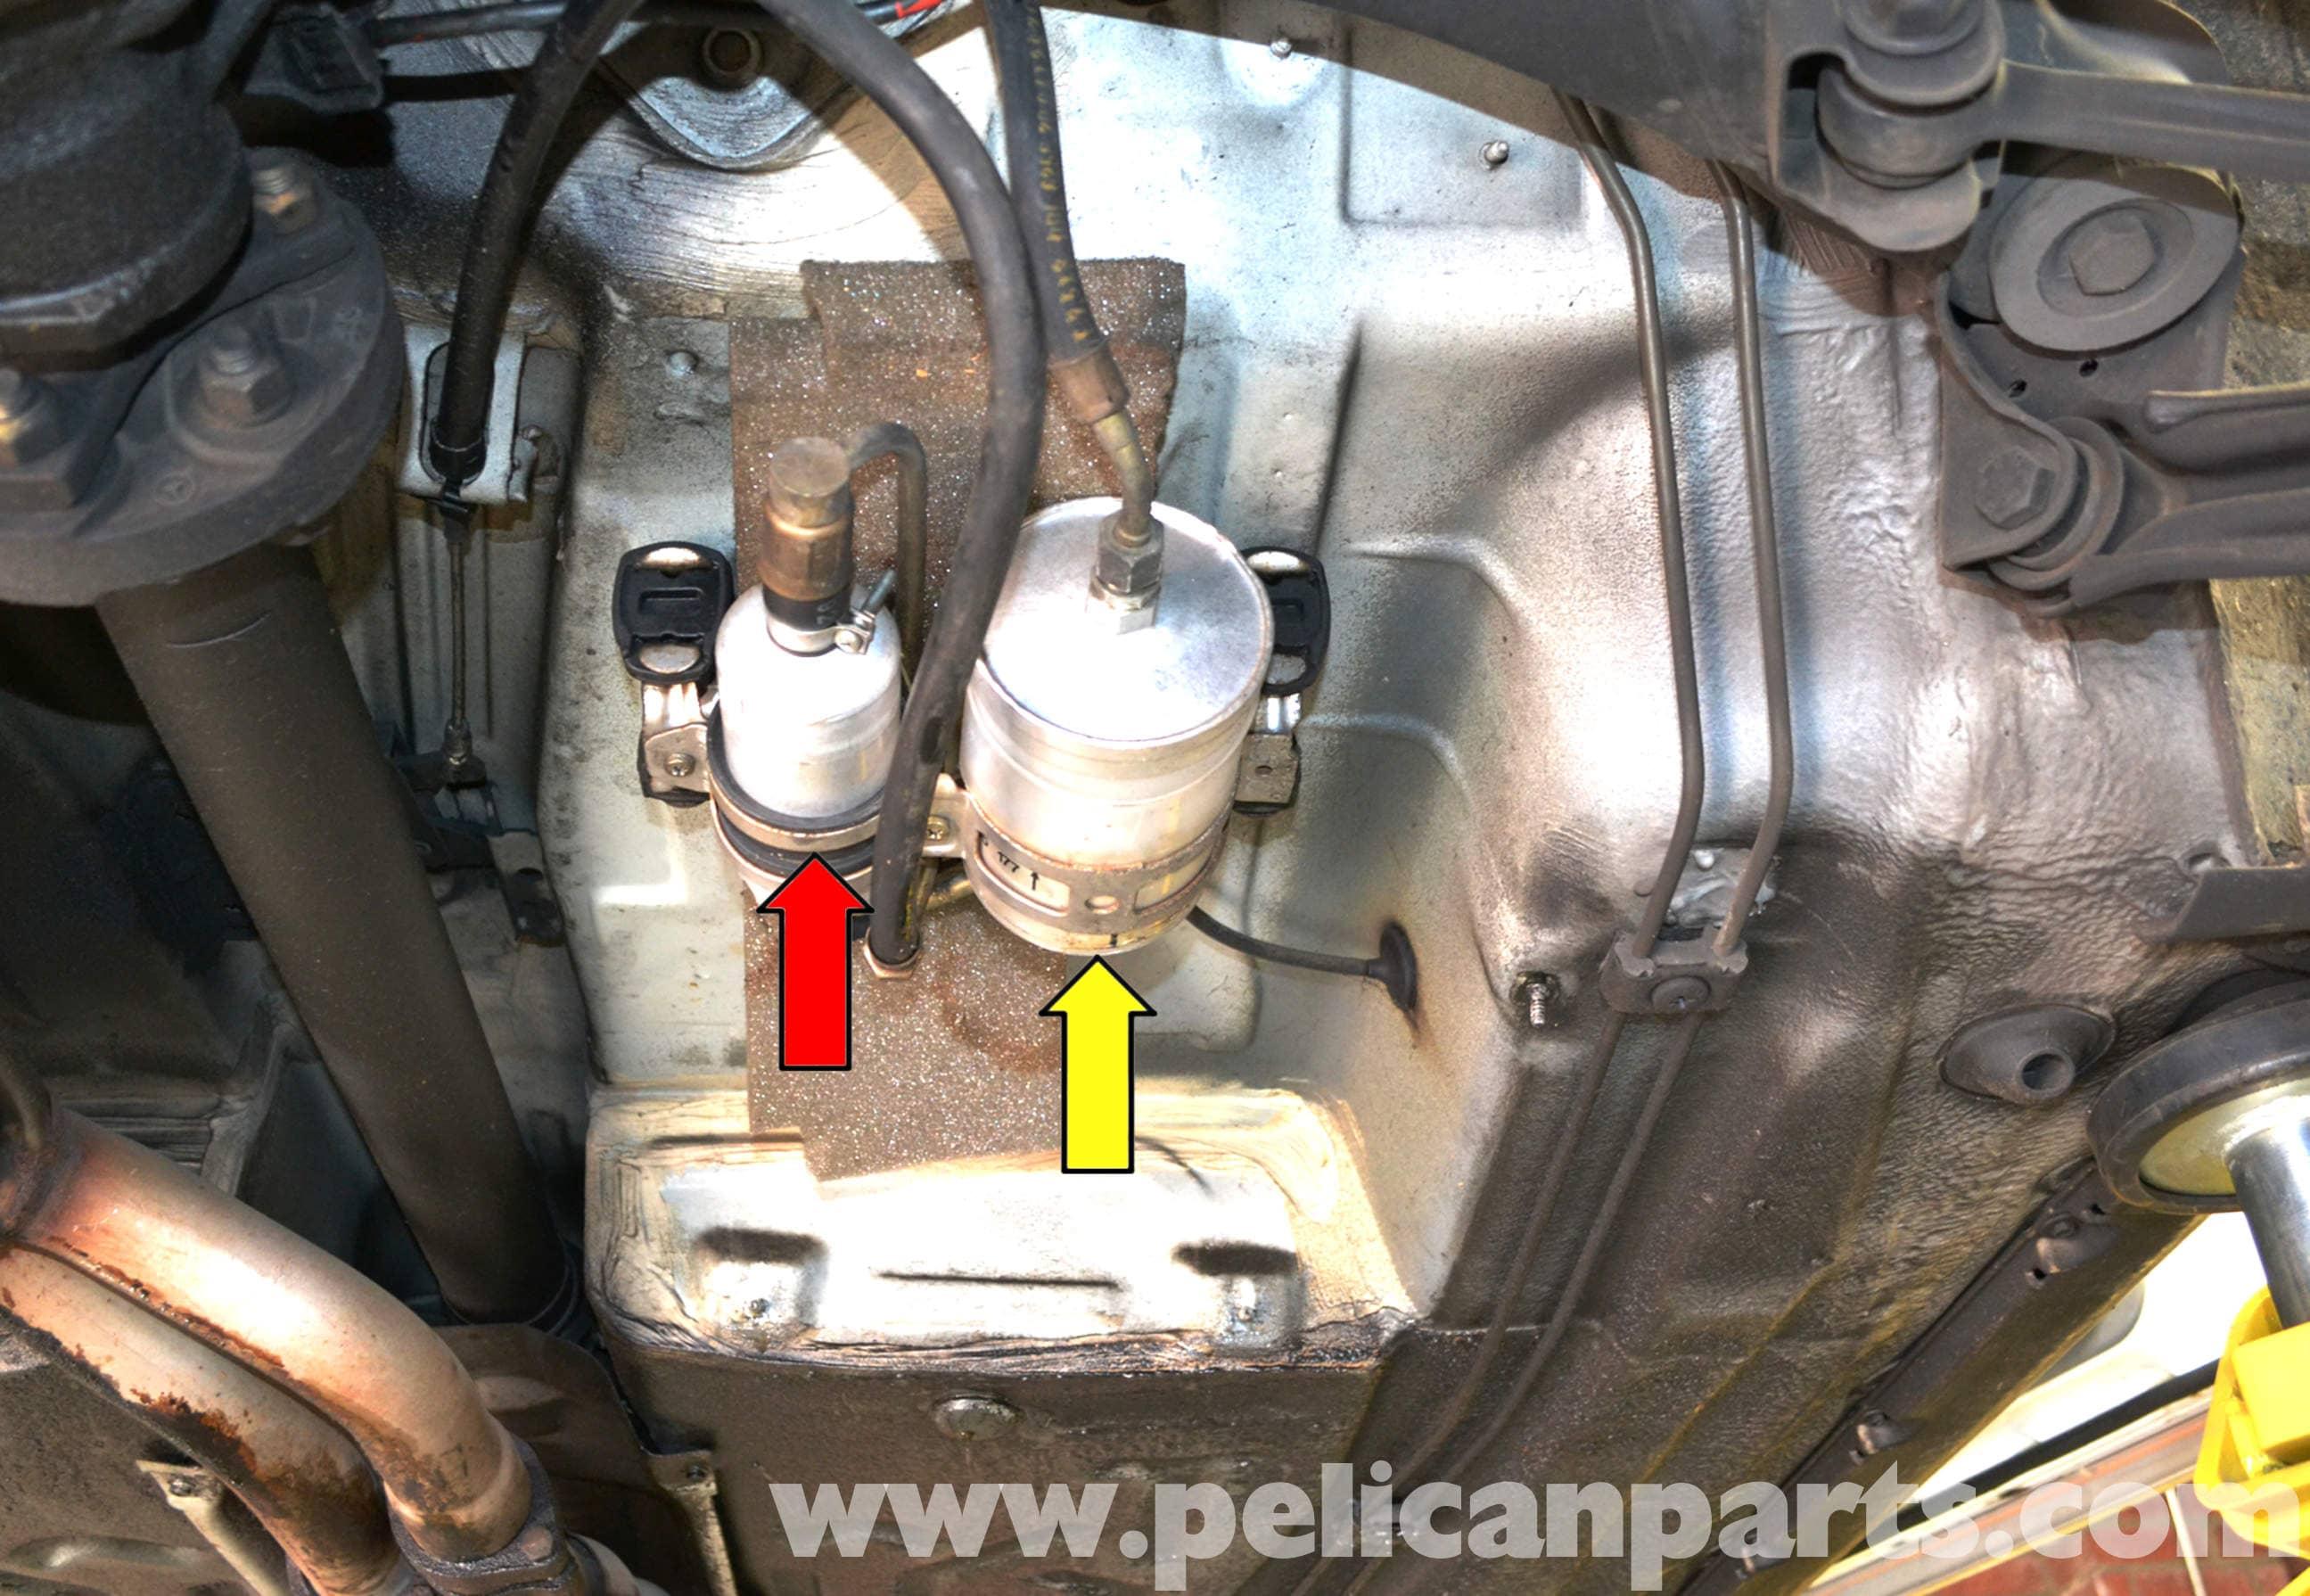 volkswagen jetta rabbit gti golf 2006 11 does not include 2005 jetta based on the a4 platform or 2006 18l gti models 2011 20l 8 valve sedan r32 models haynes automotive repair manuals